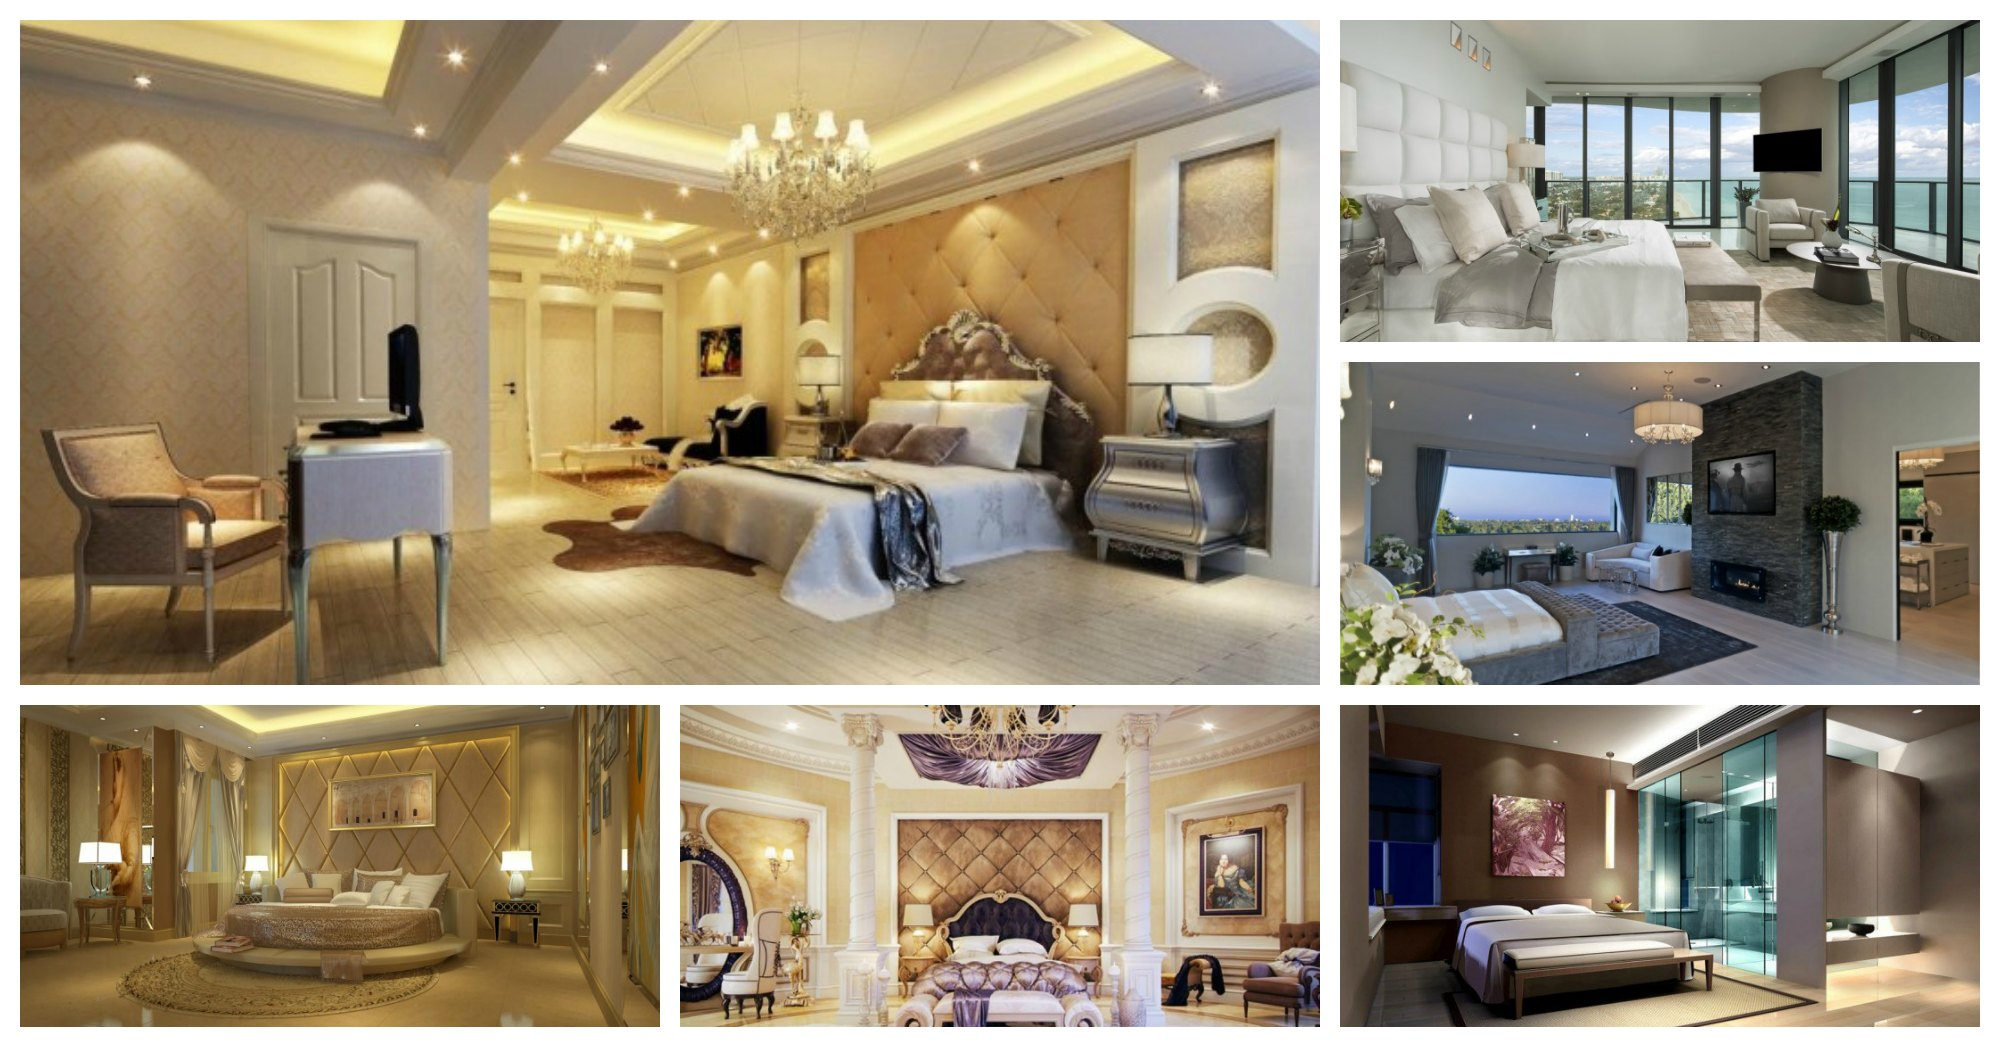 10 Fascinating Mansion Master Bedroom Designs